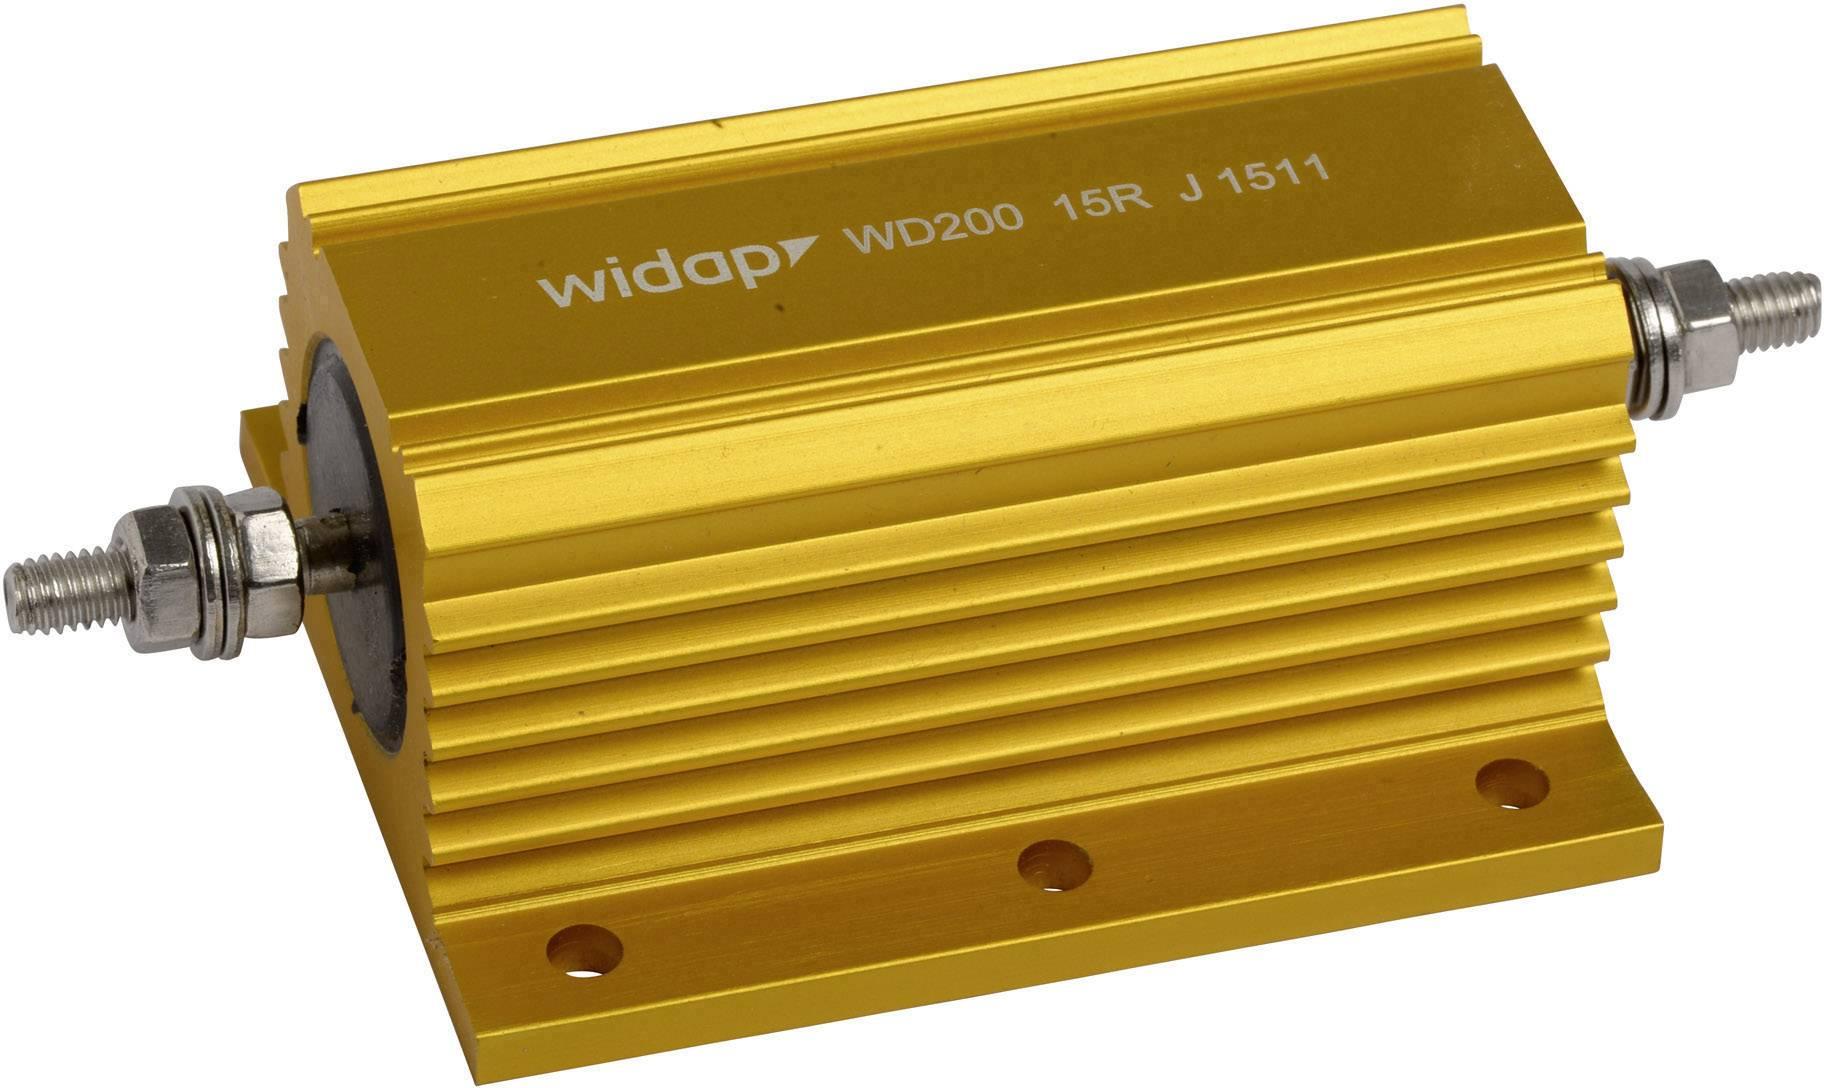 Drôtový rezistor Widap 160156, hodnota odporu 100 Ohm, 200 W, 1 ks